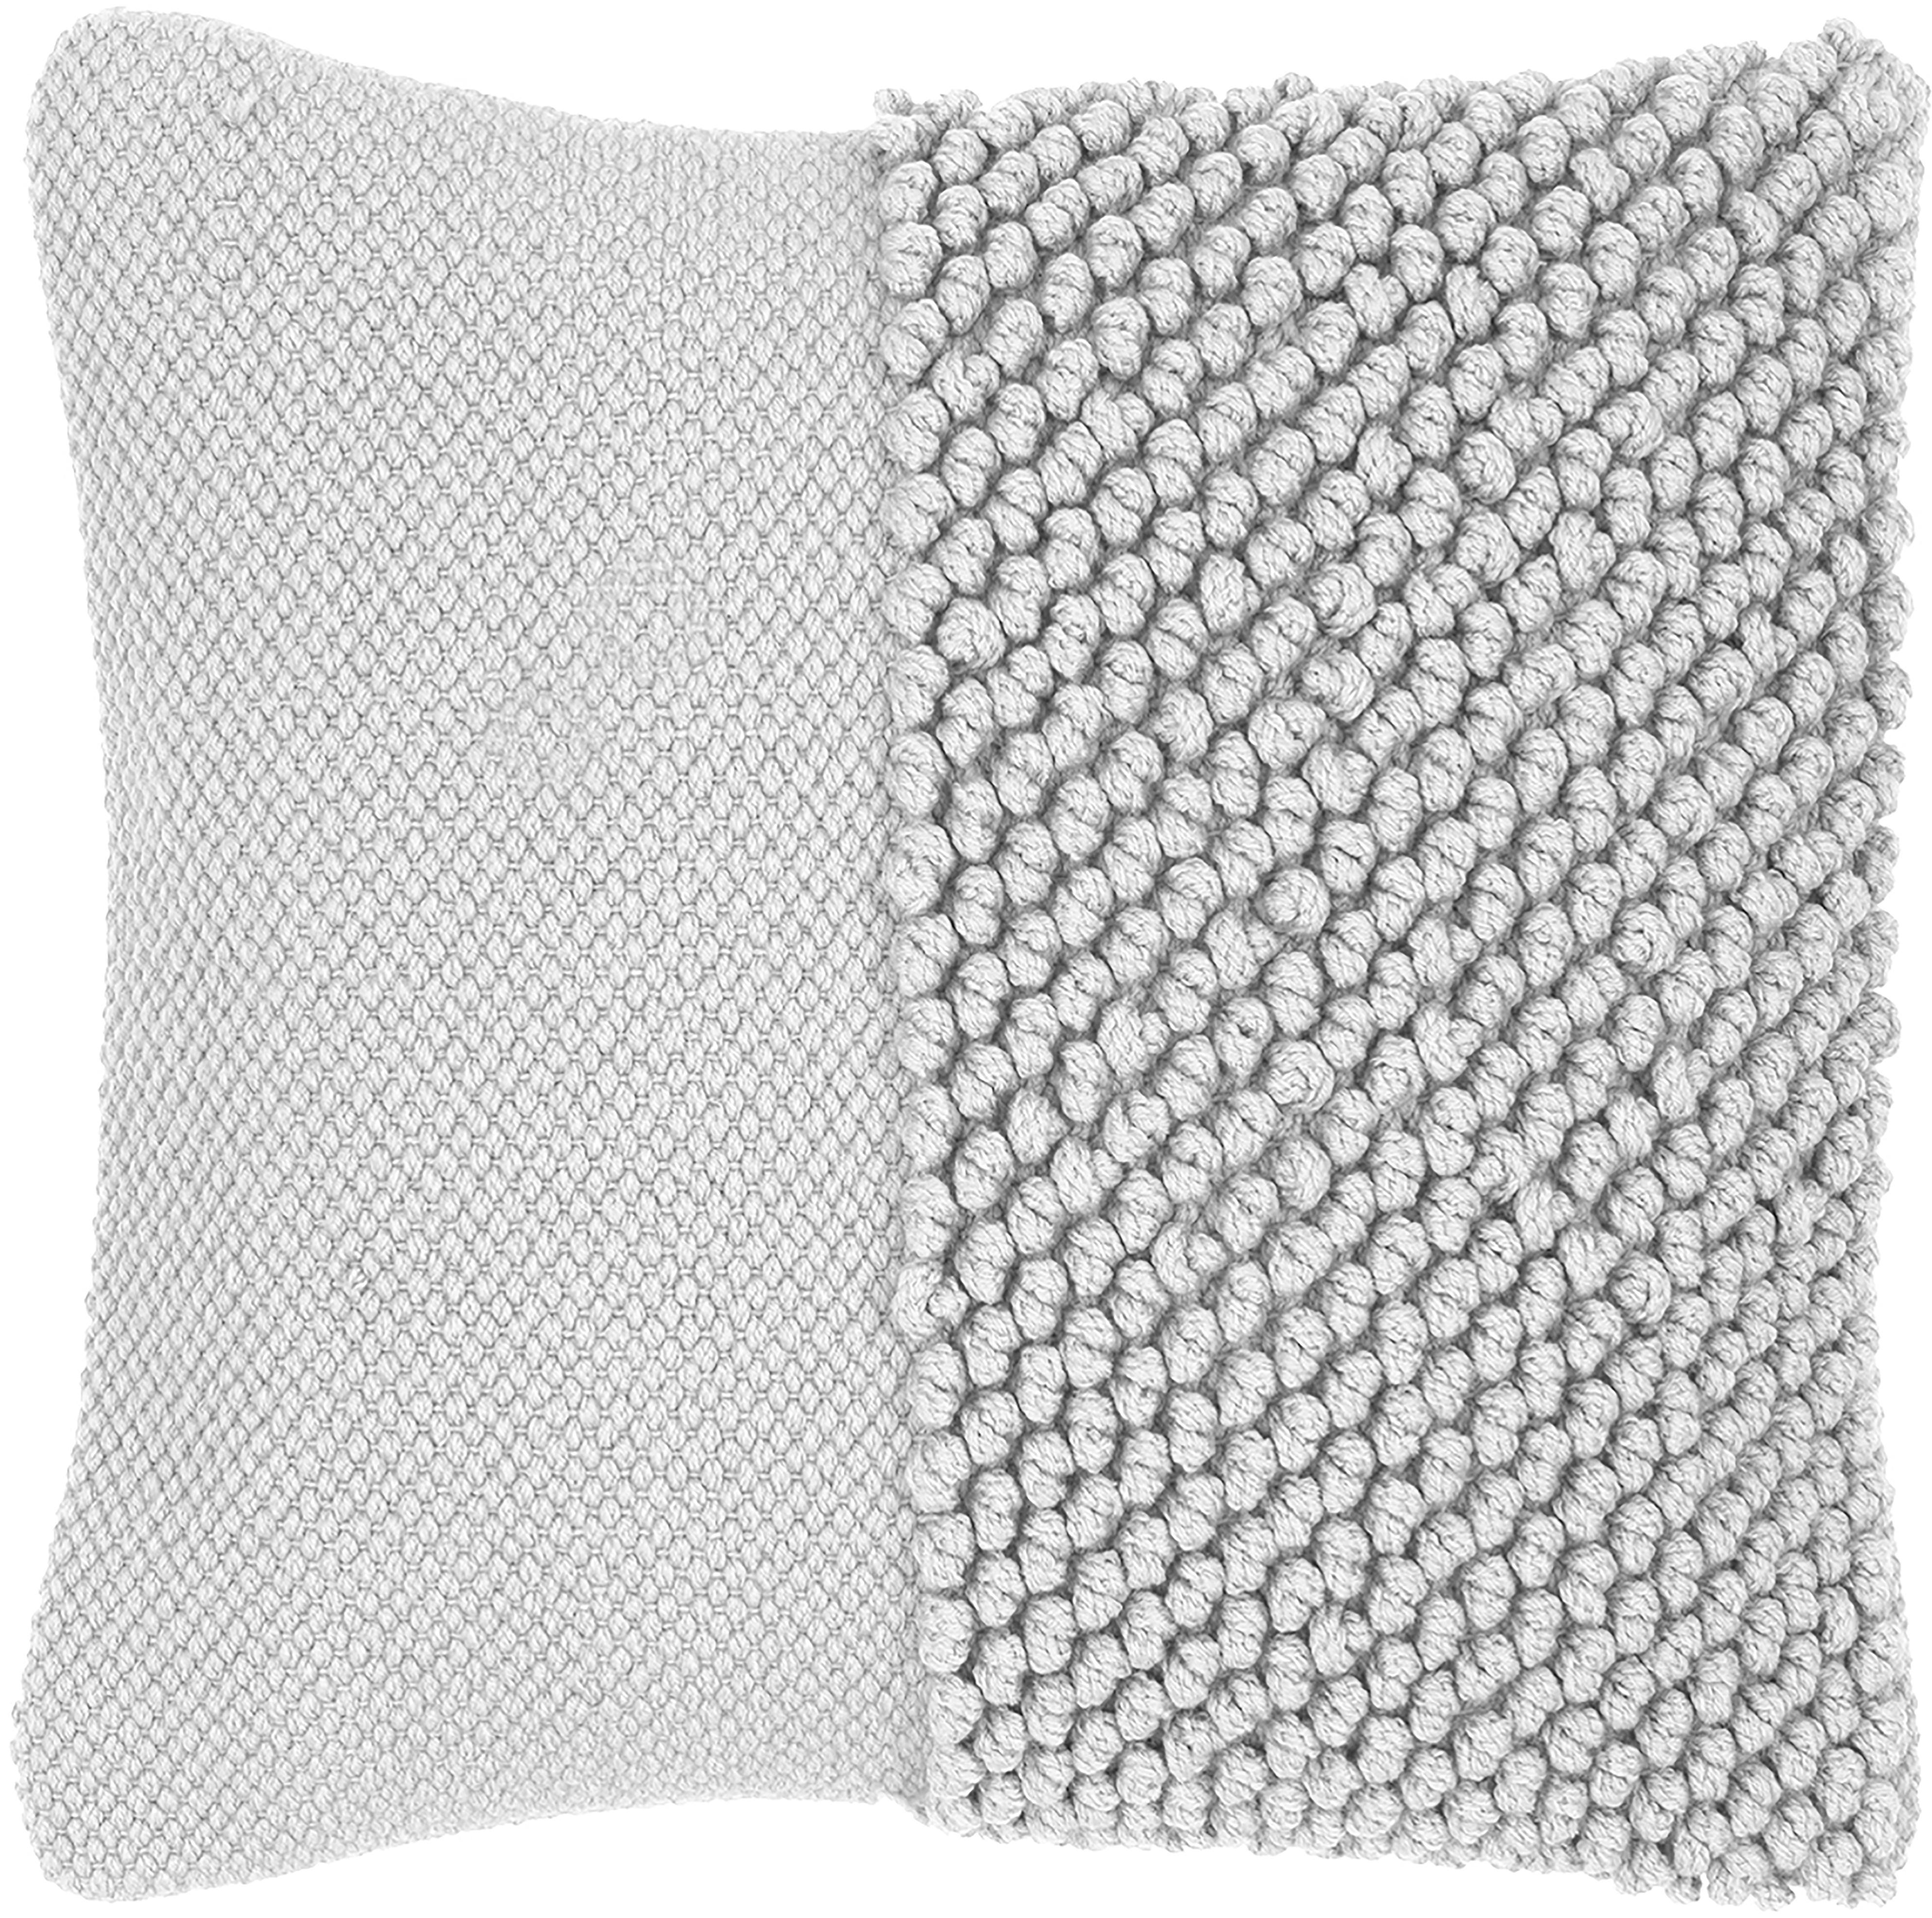 Poszewka na poduszkę Andi, 90% akryl, 10% bawełna, Jasny szary, S 40 x D 40 cm